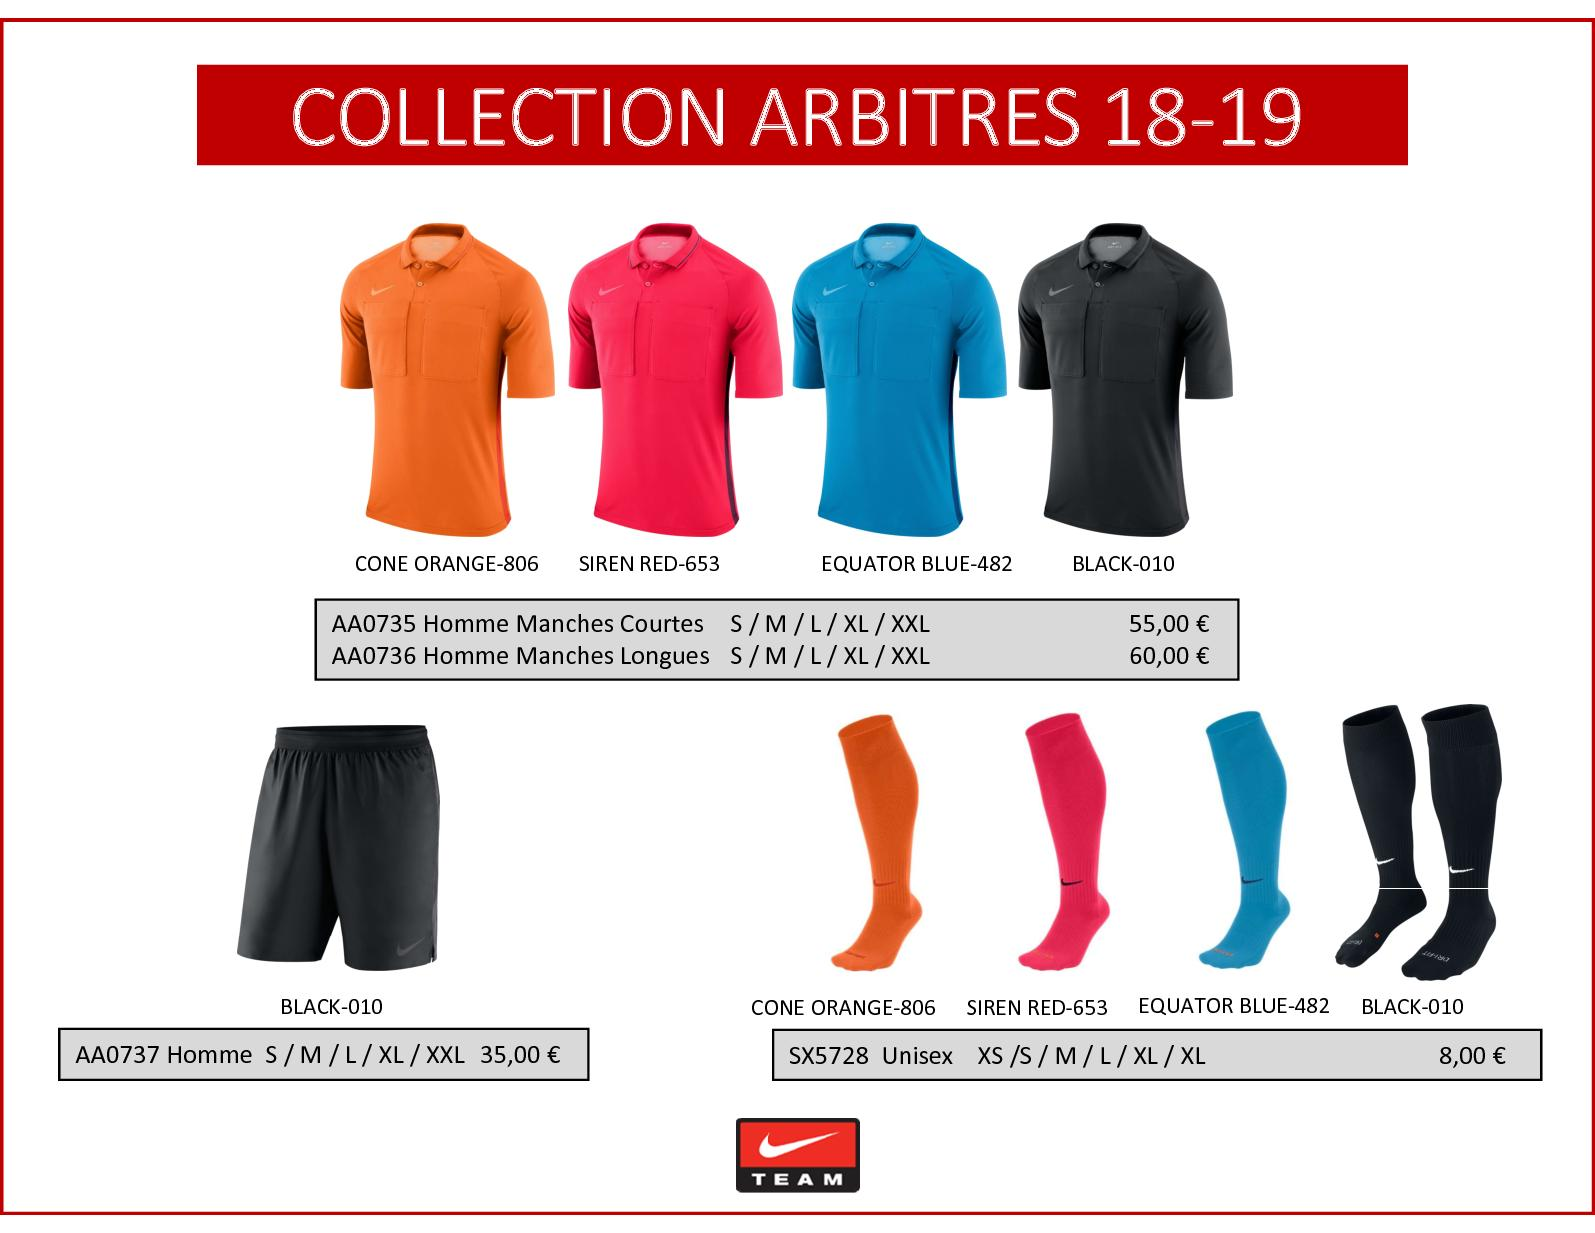 c8c2e424e http   collections.estudiobrillantina.com descry-Doudoune D ...